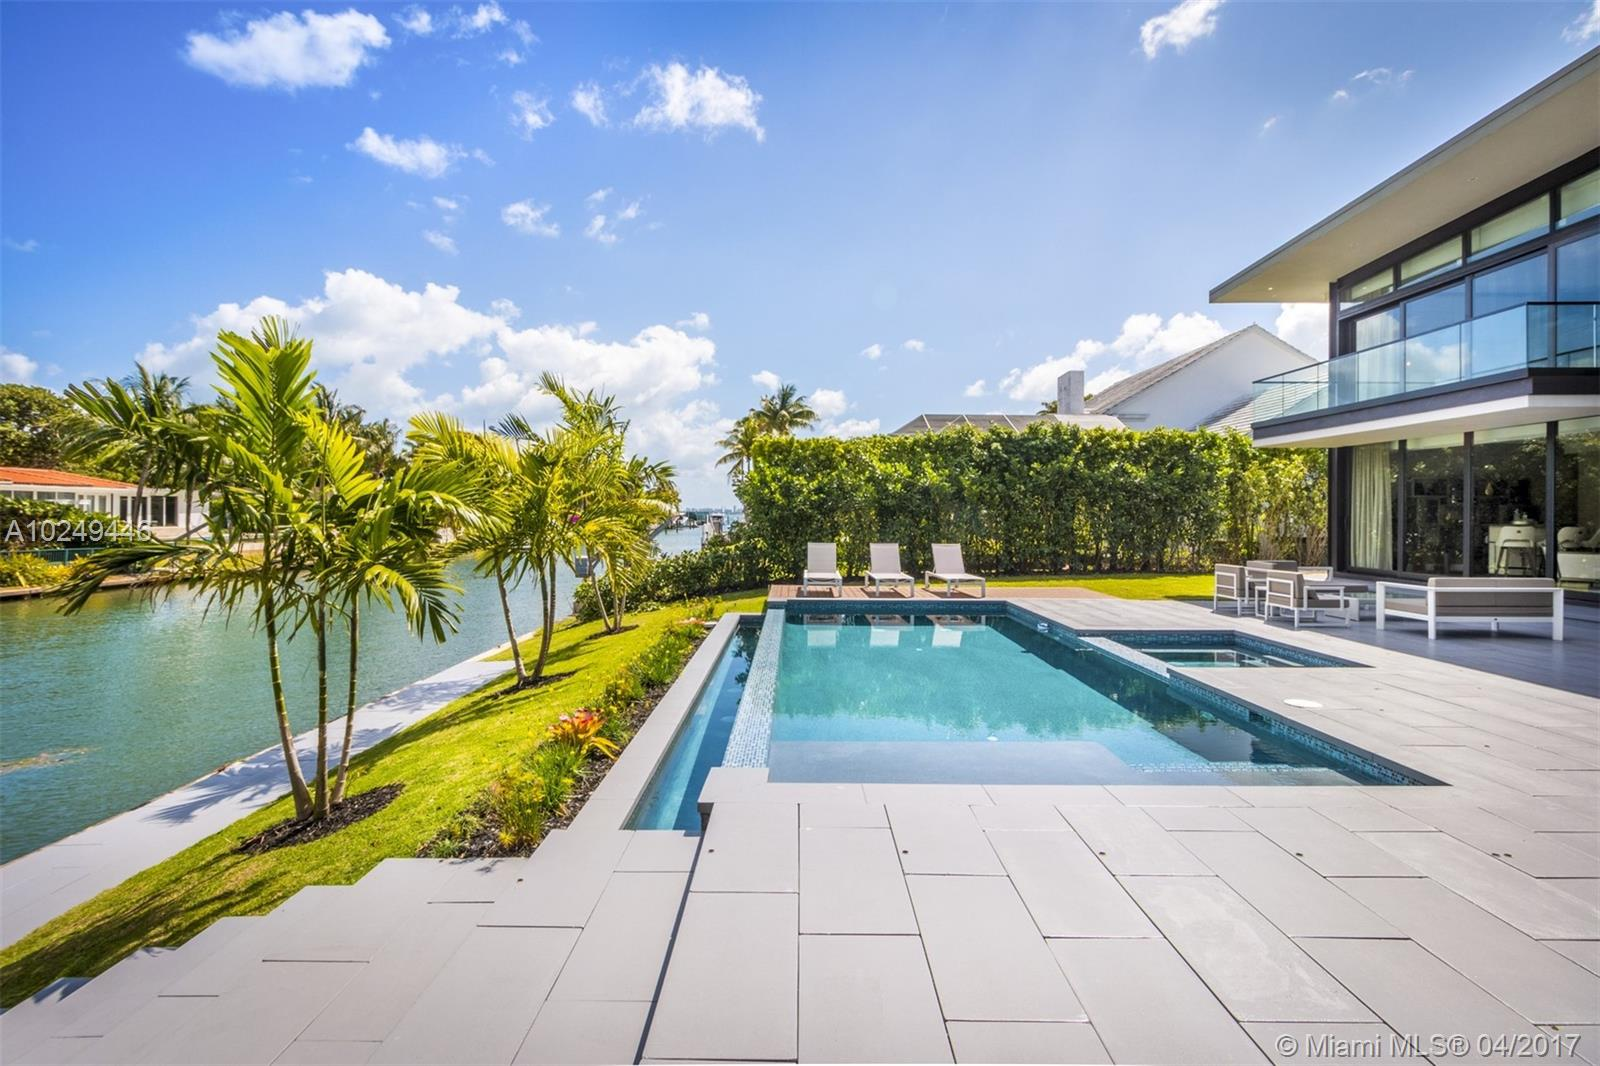 721 Buttonwood Ln, Miami, FL 33137